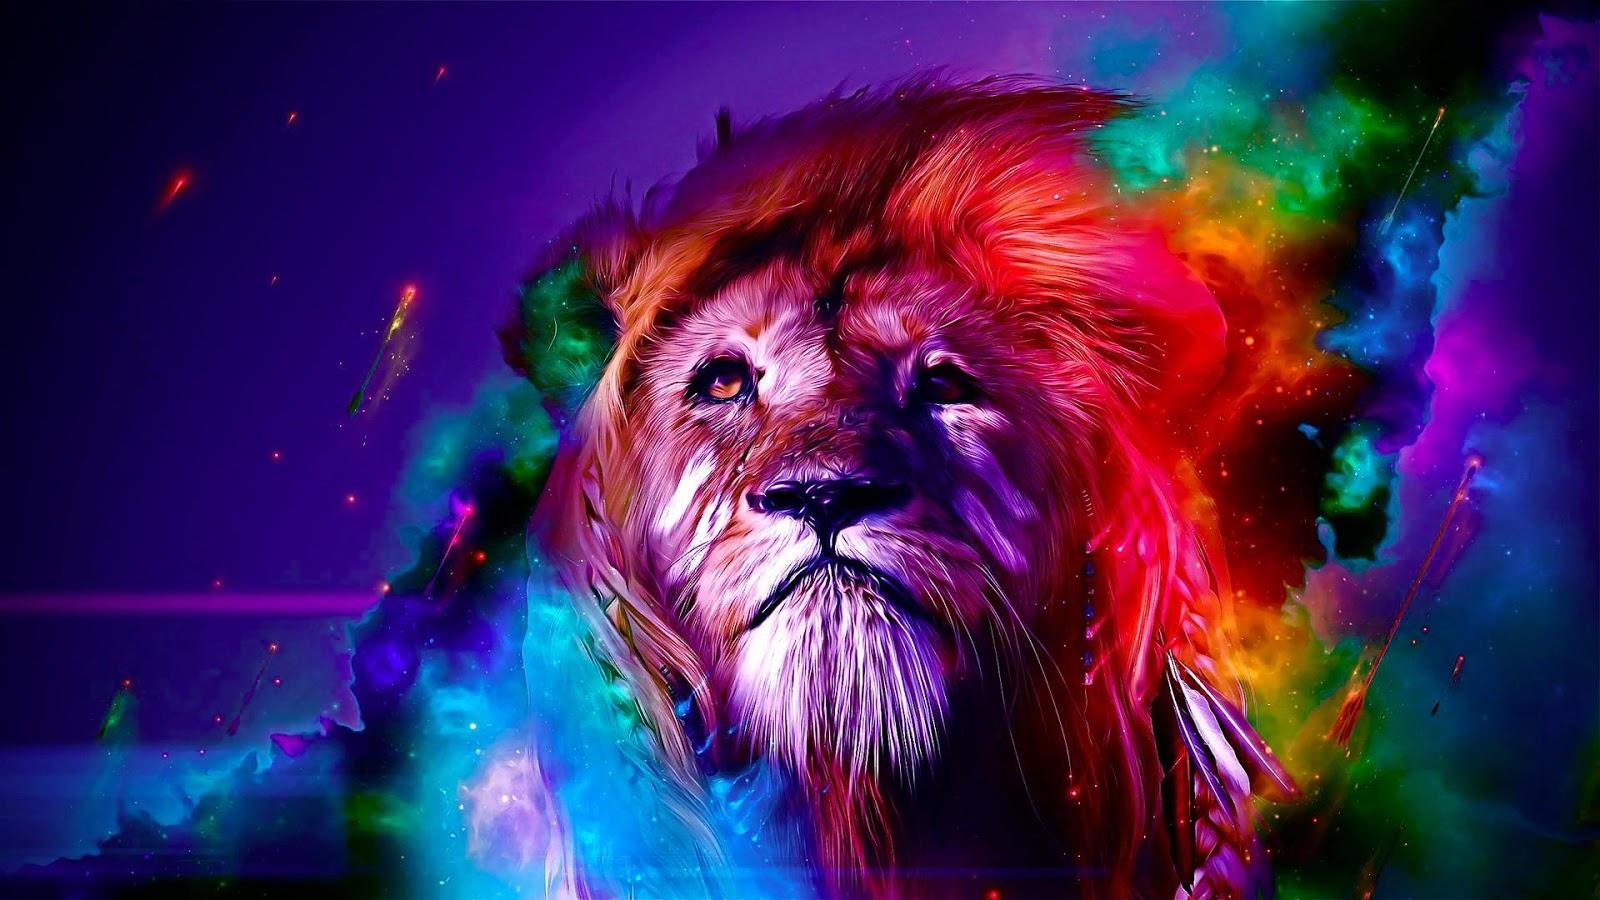 cool lion wallpaper 5 - fullscreenwallpaper